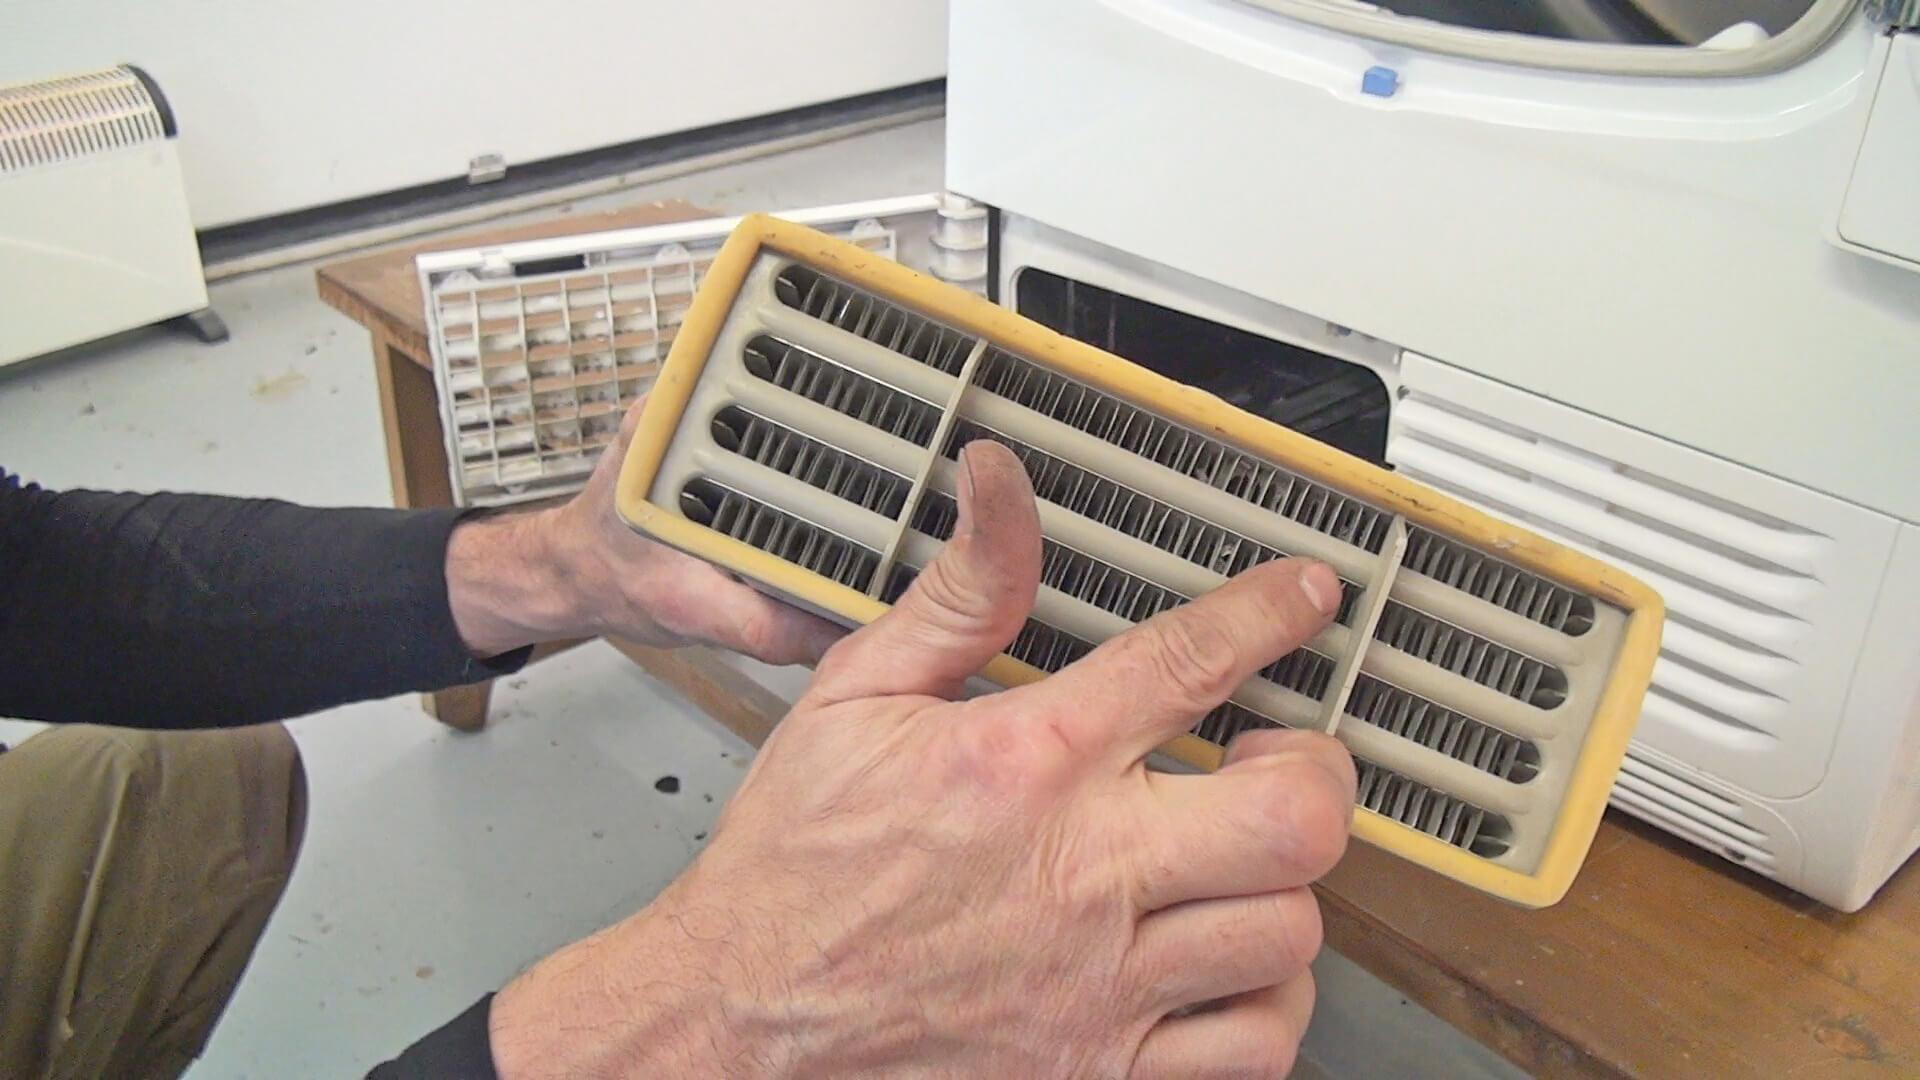 Kondensator reinigen / Lamellen reinigen